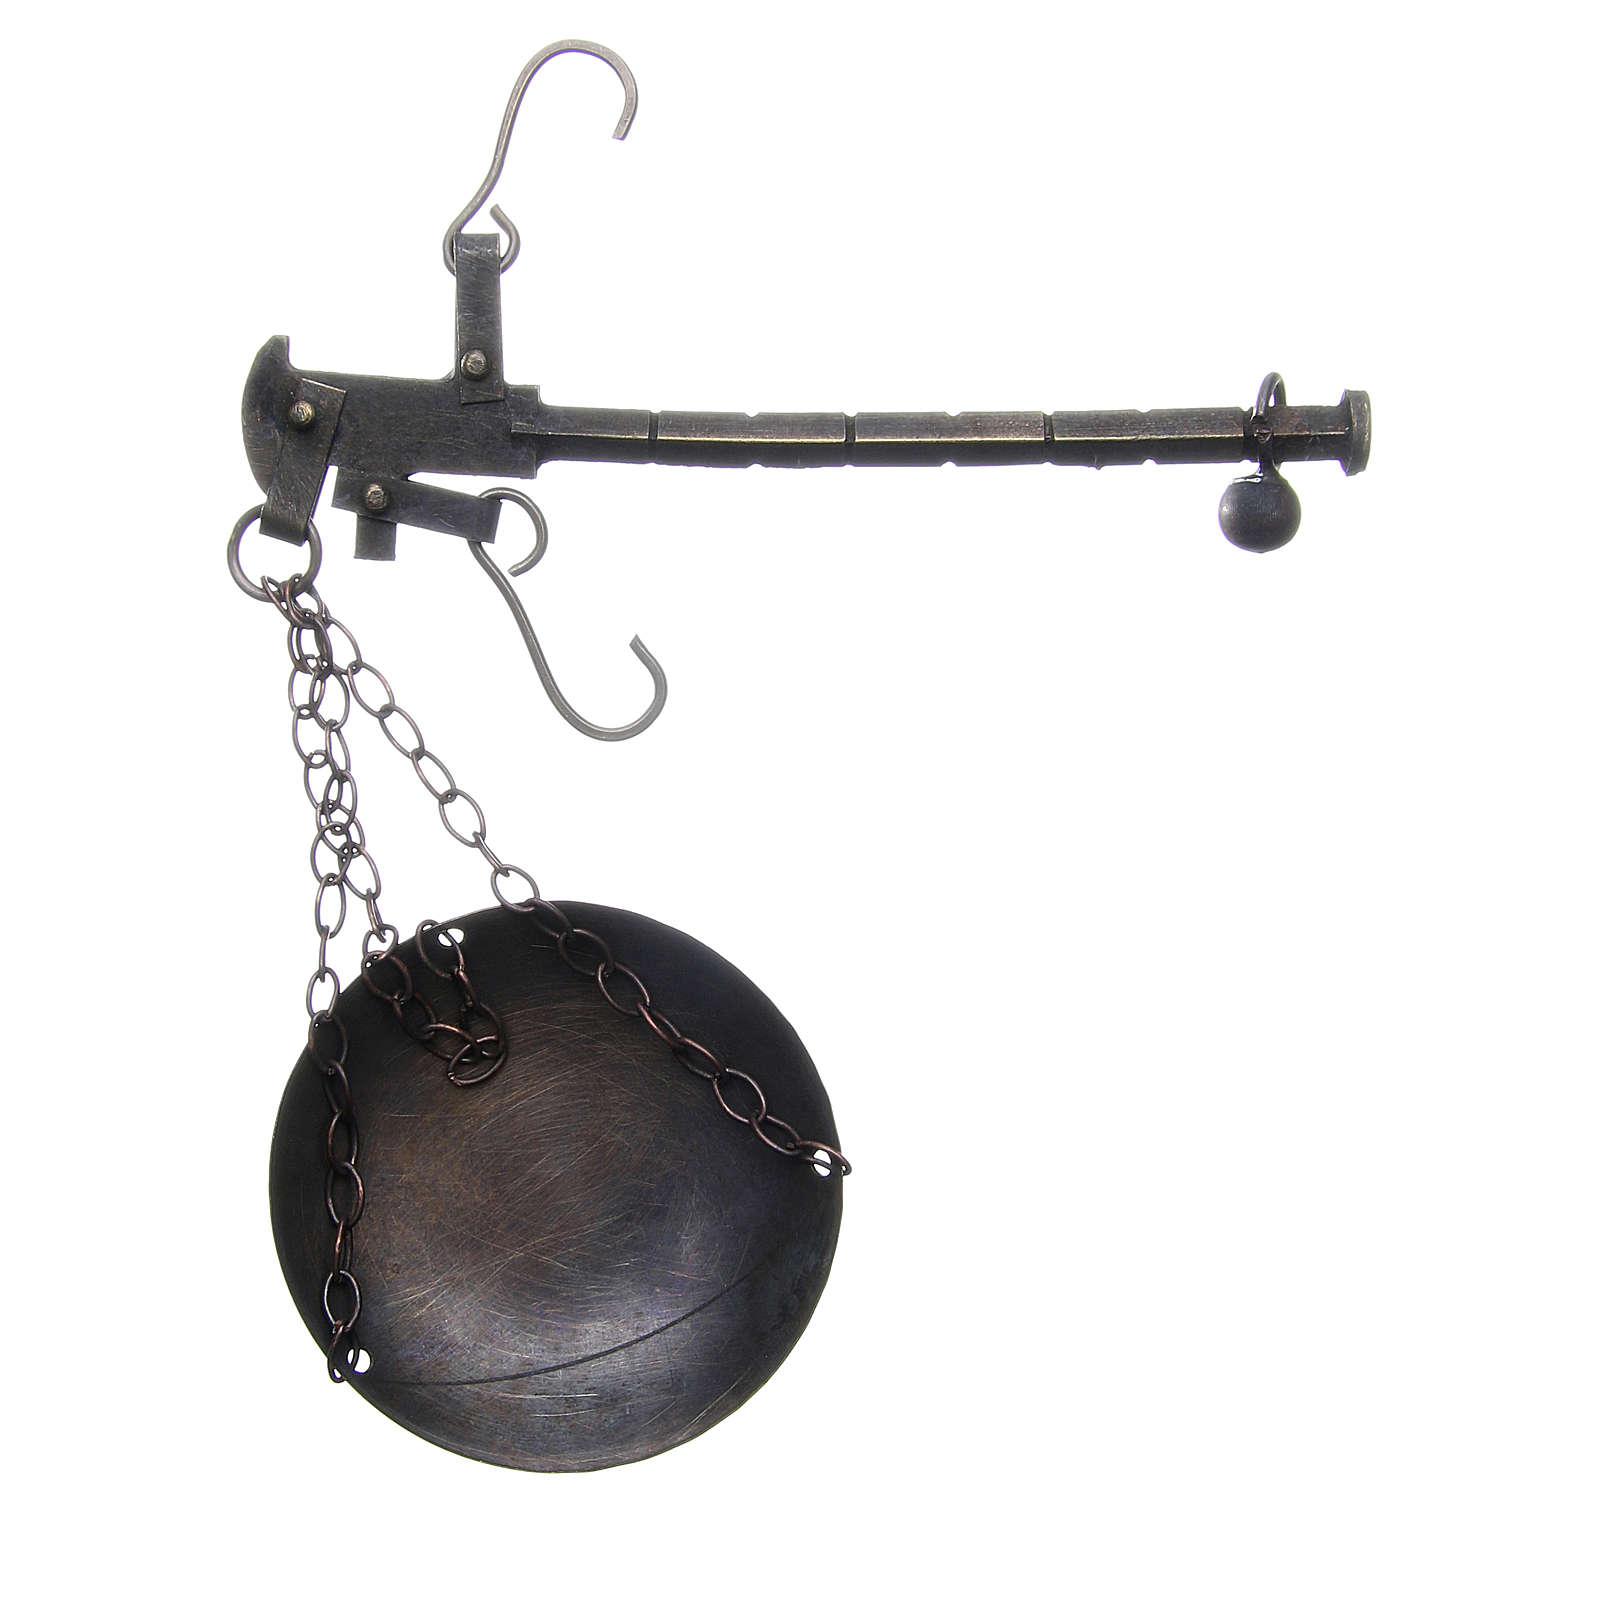 Balanza en metal diam 6 cm belén Nápoles 4